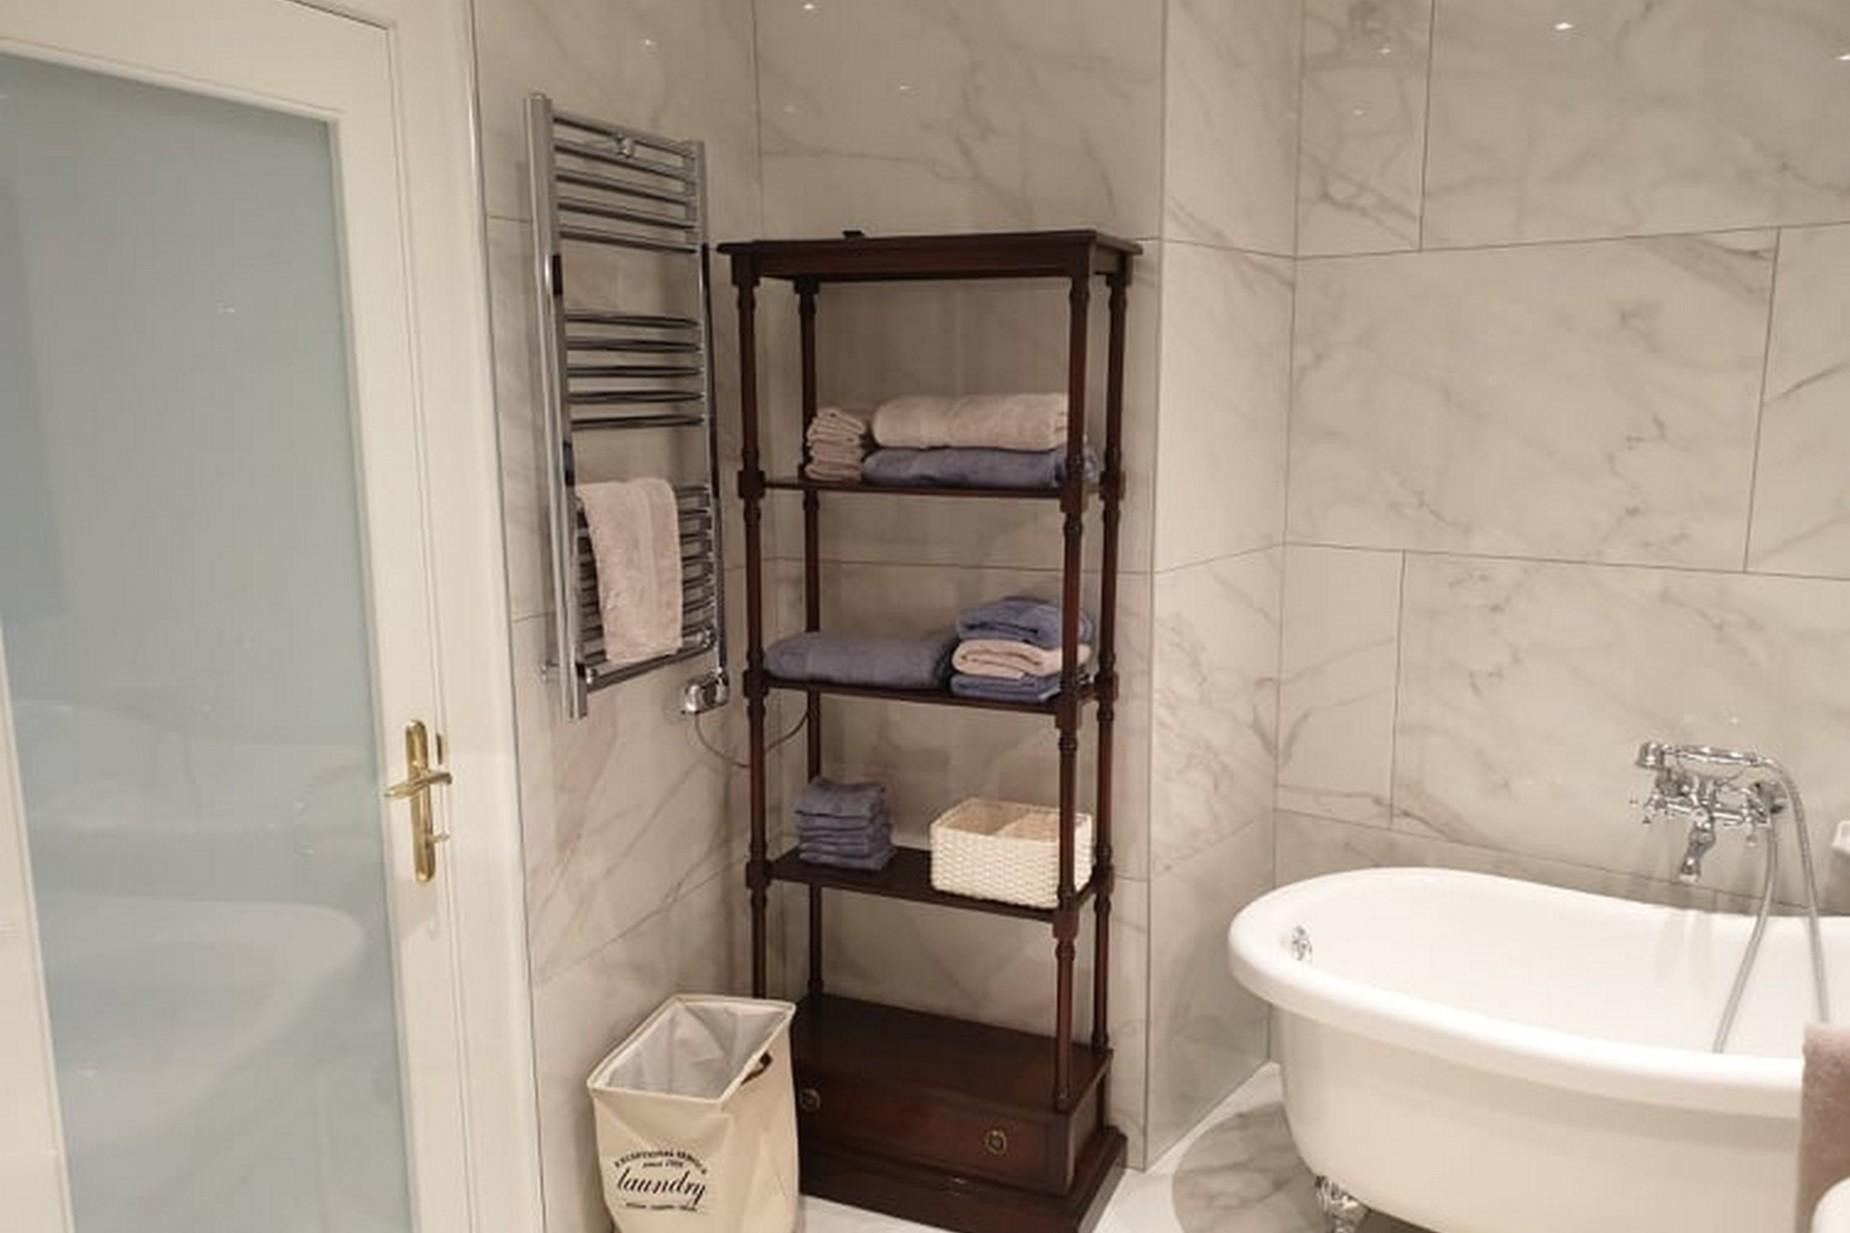 3 bed Apartment For Rent in Birkirkara, Birkirkara - thumb 13